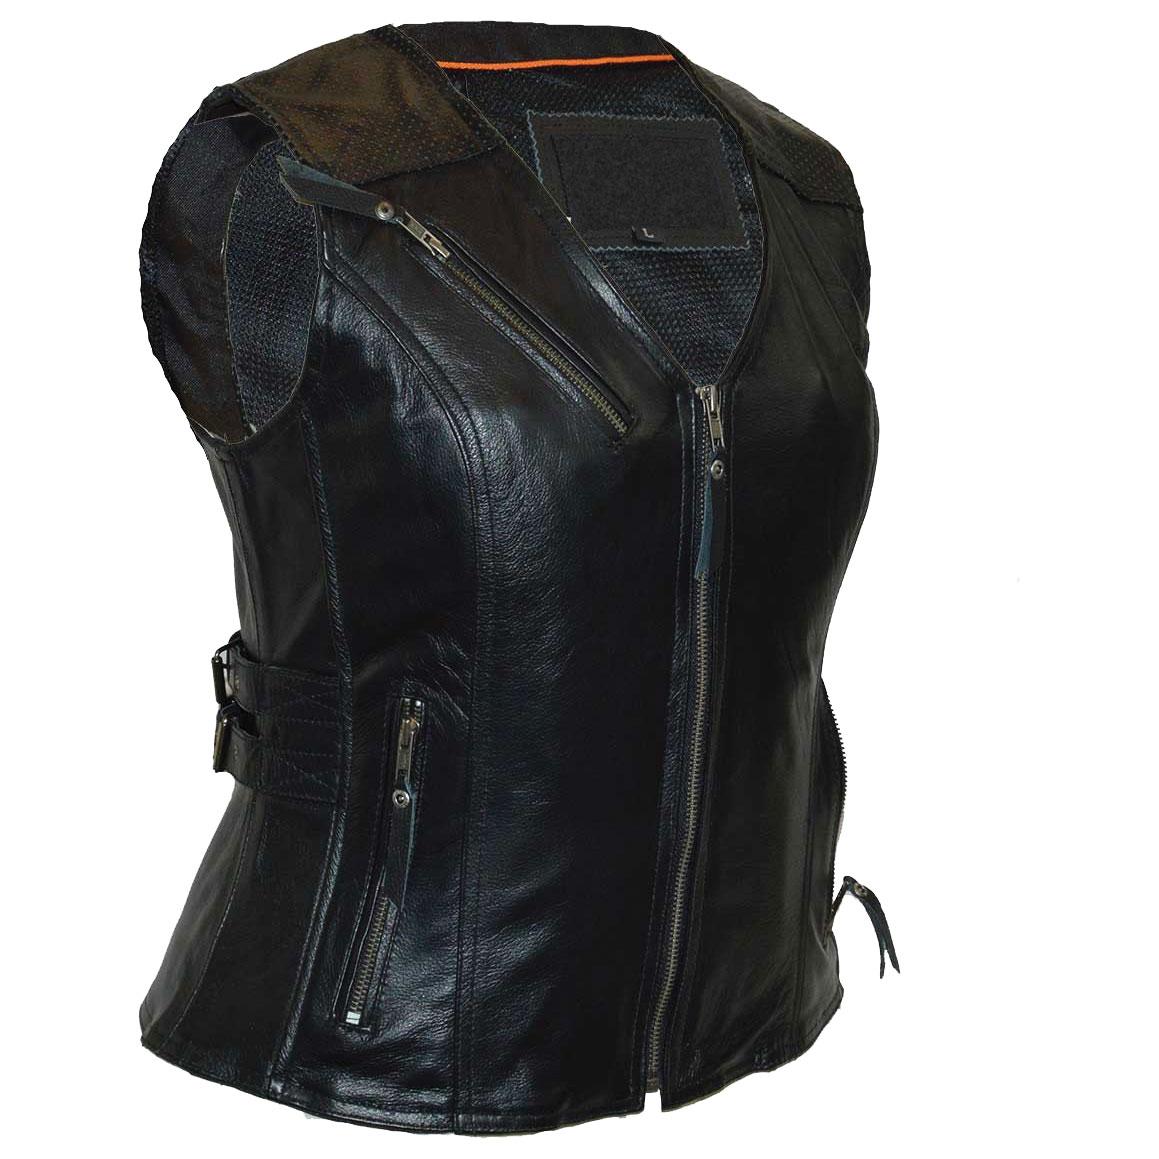 Vance Leathers Women's Buckled Black Leather Vest